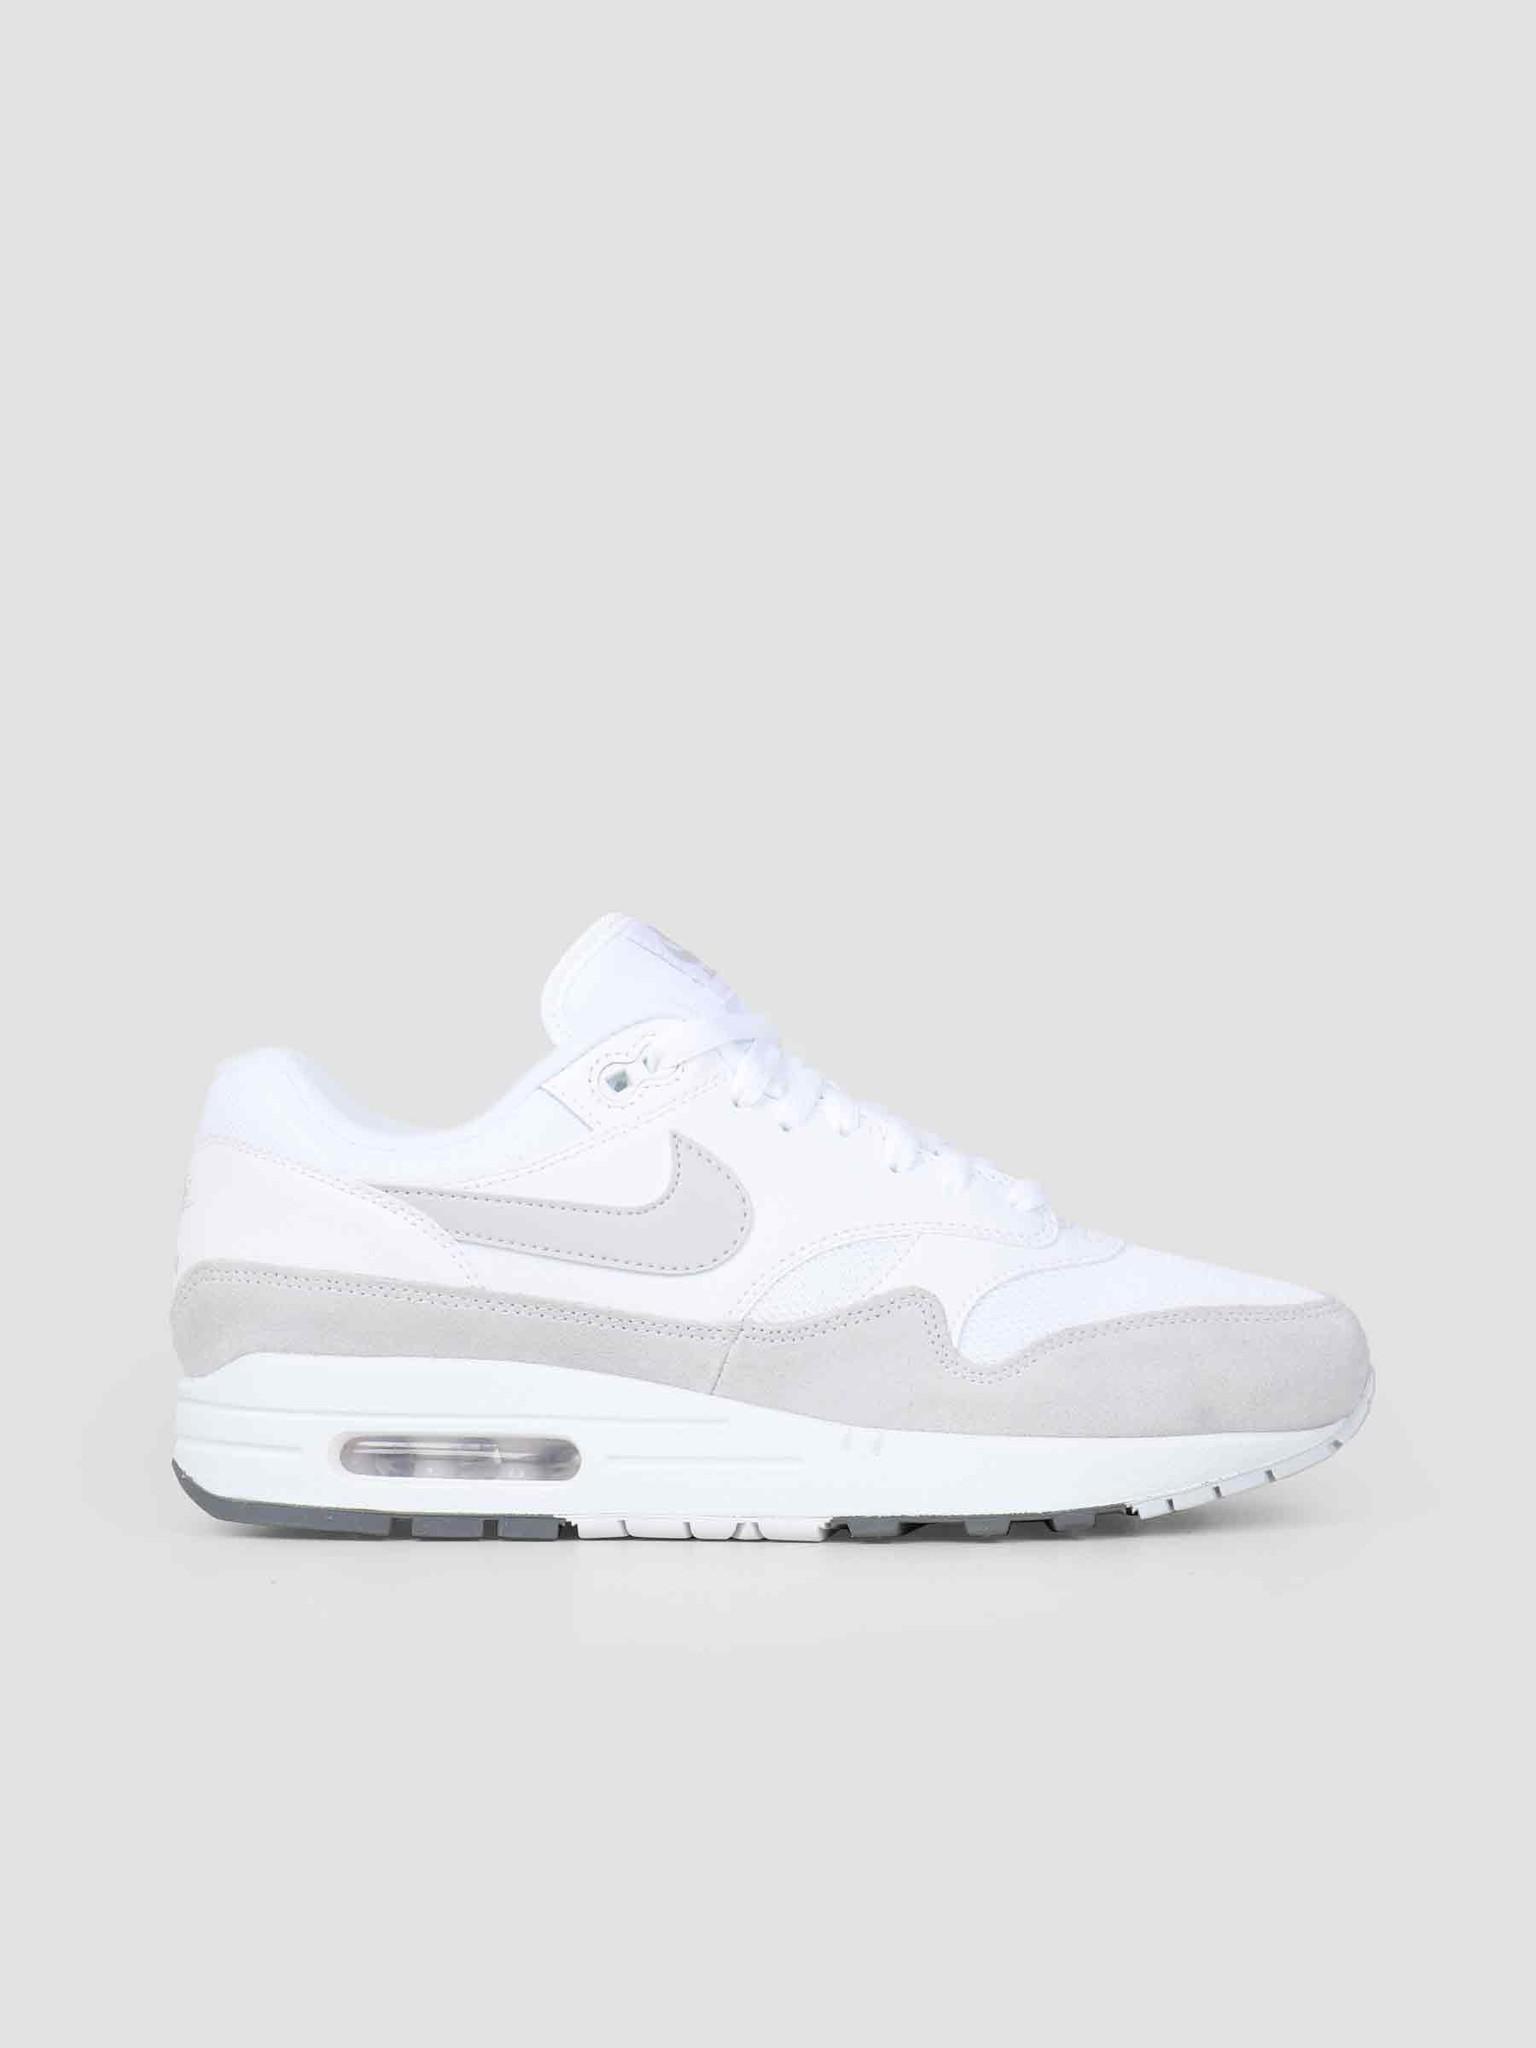 online retailer 8758a a1613 Nike Nike Air Max 1 Shoe White Pure Platinum Cool Grey AH8145-110